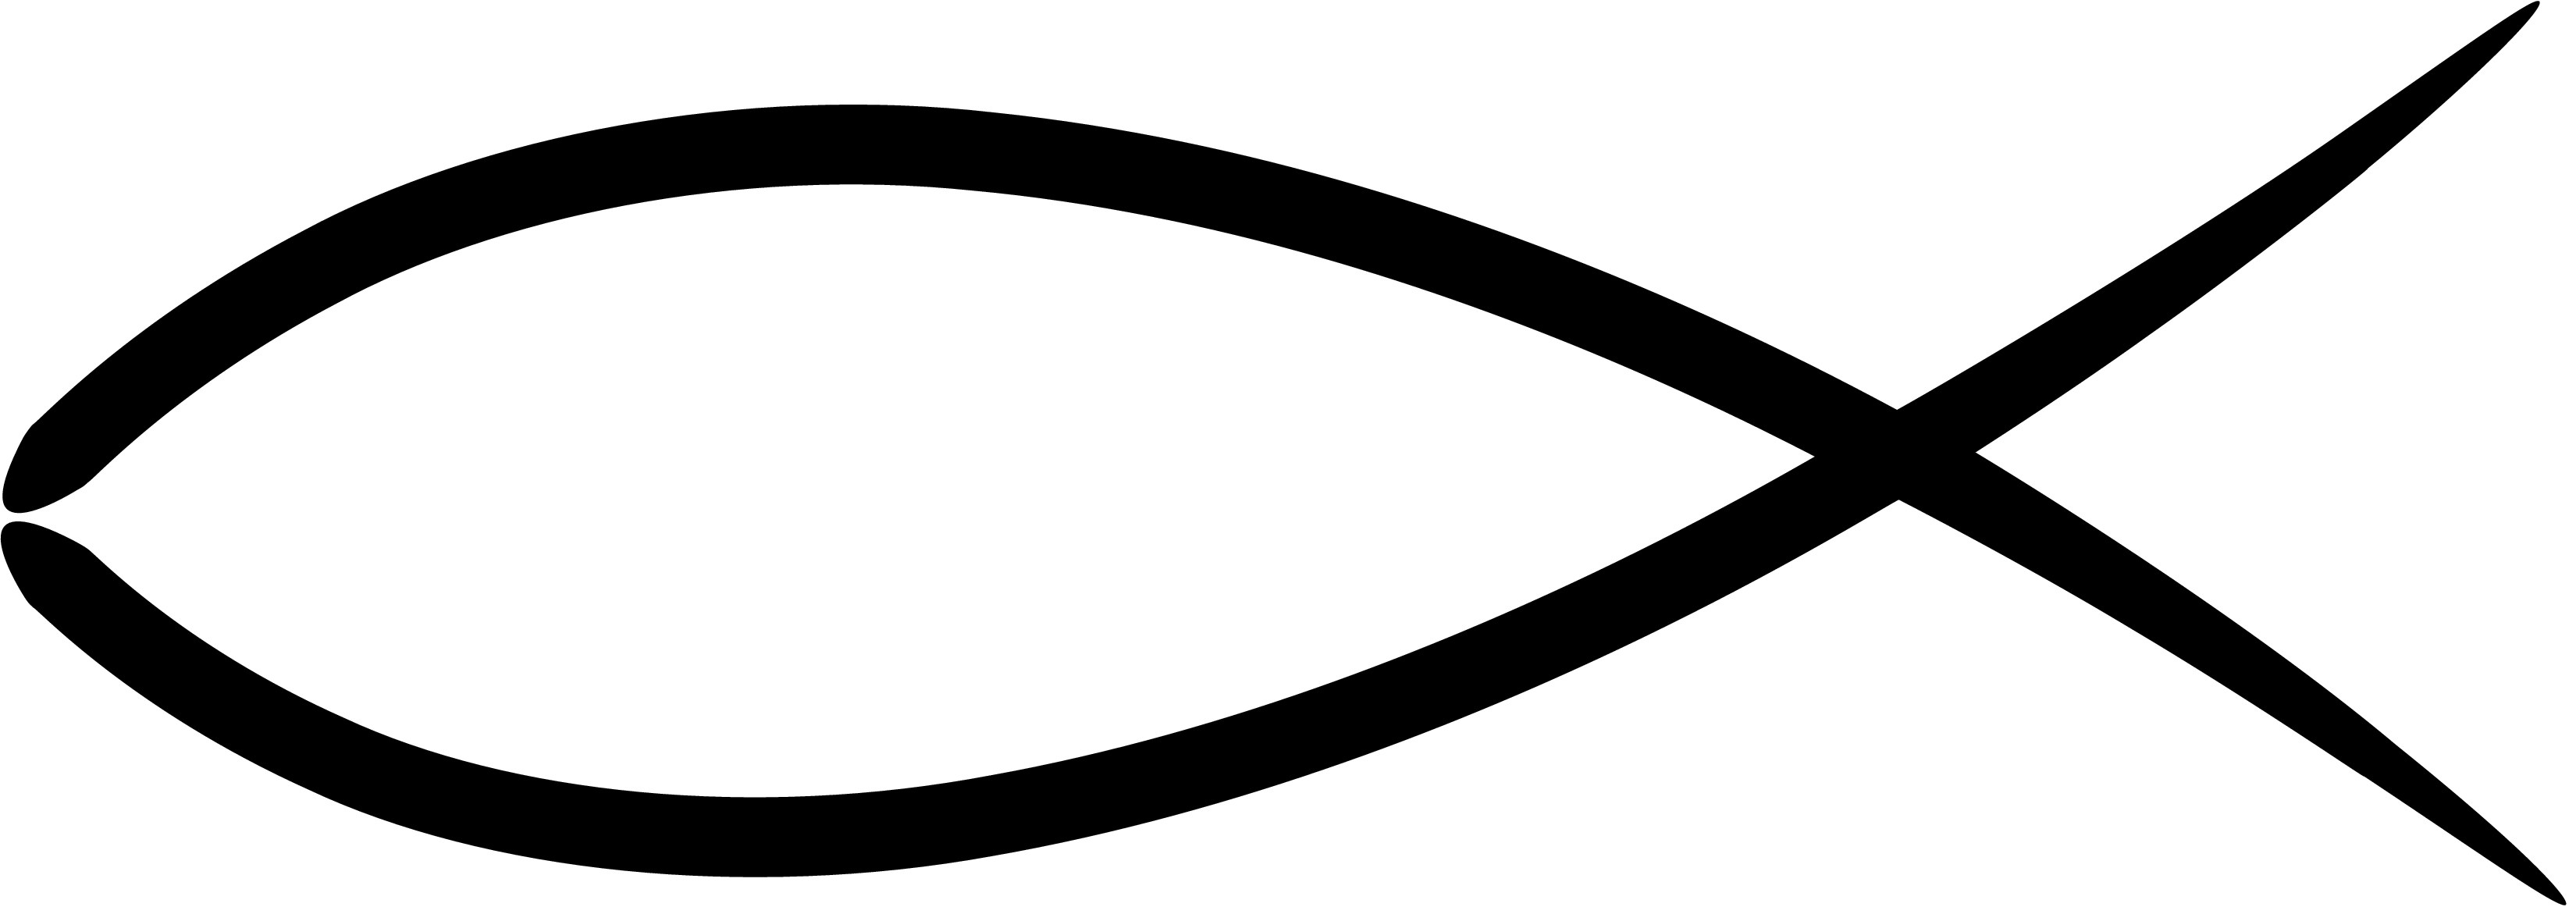 christian-fish-symbol-bargain-bed-outlet-1j1hgI-clipart